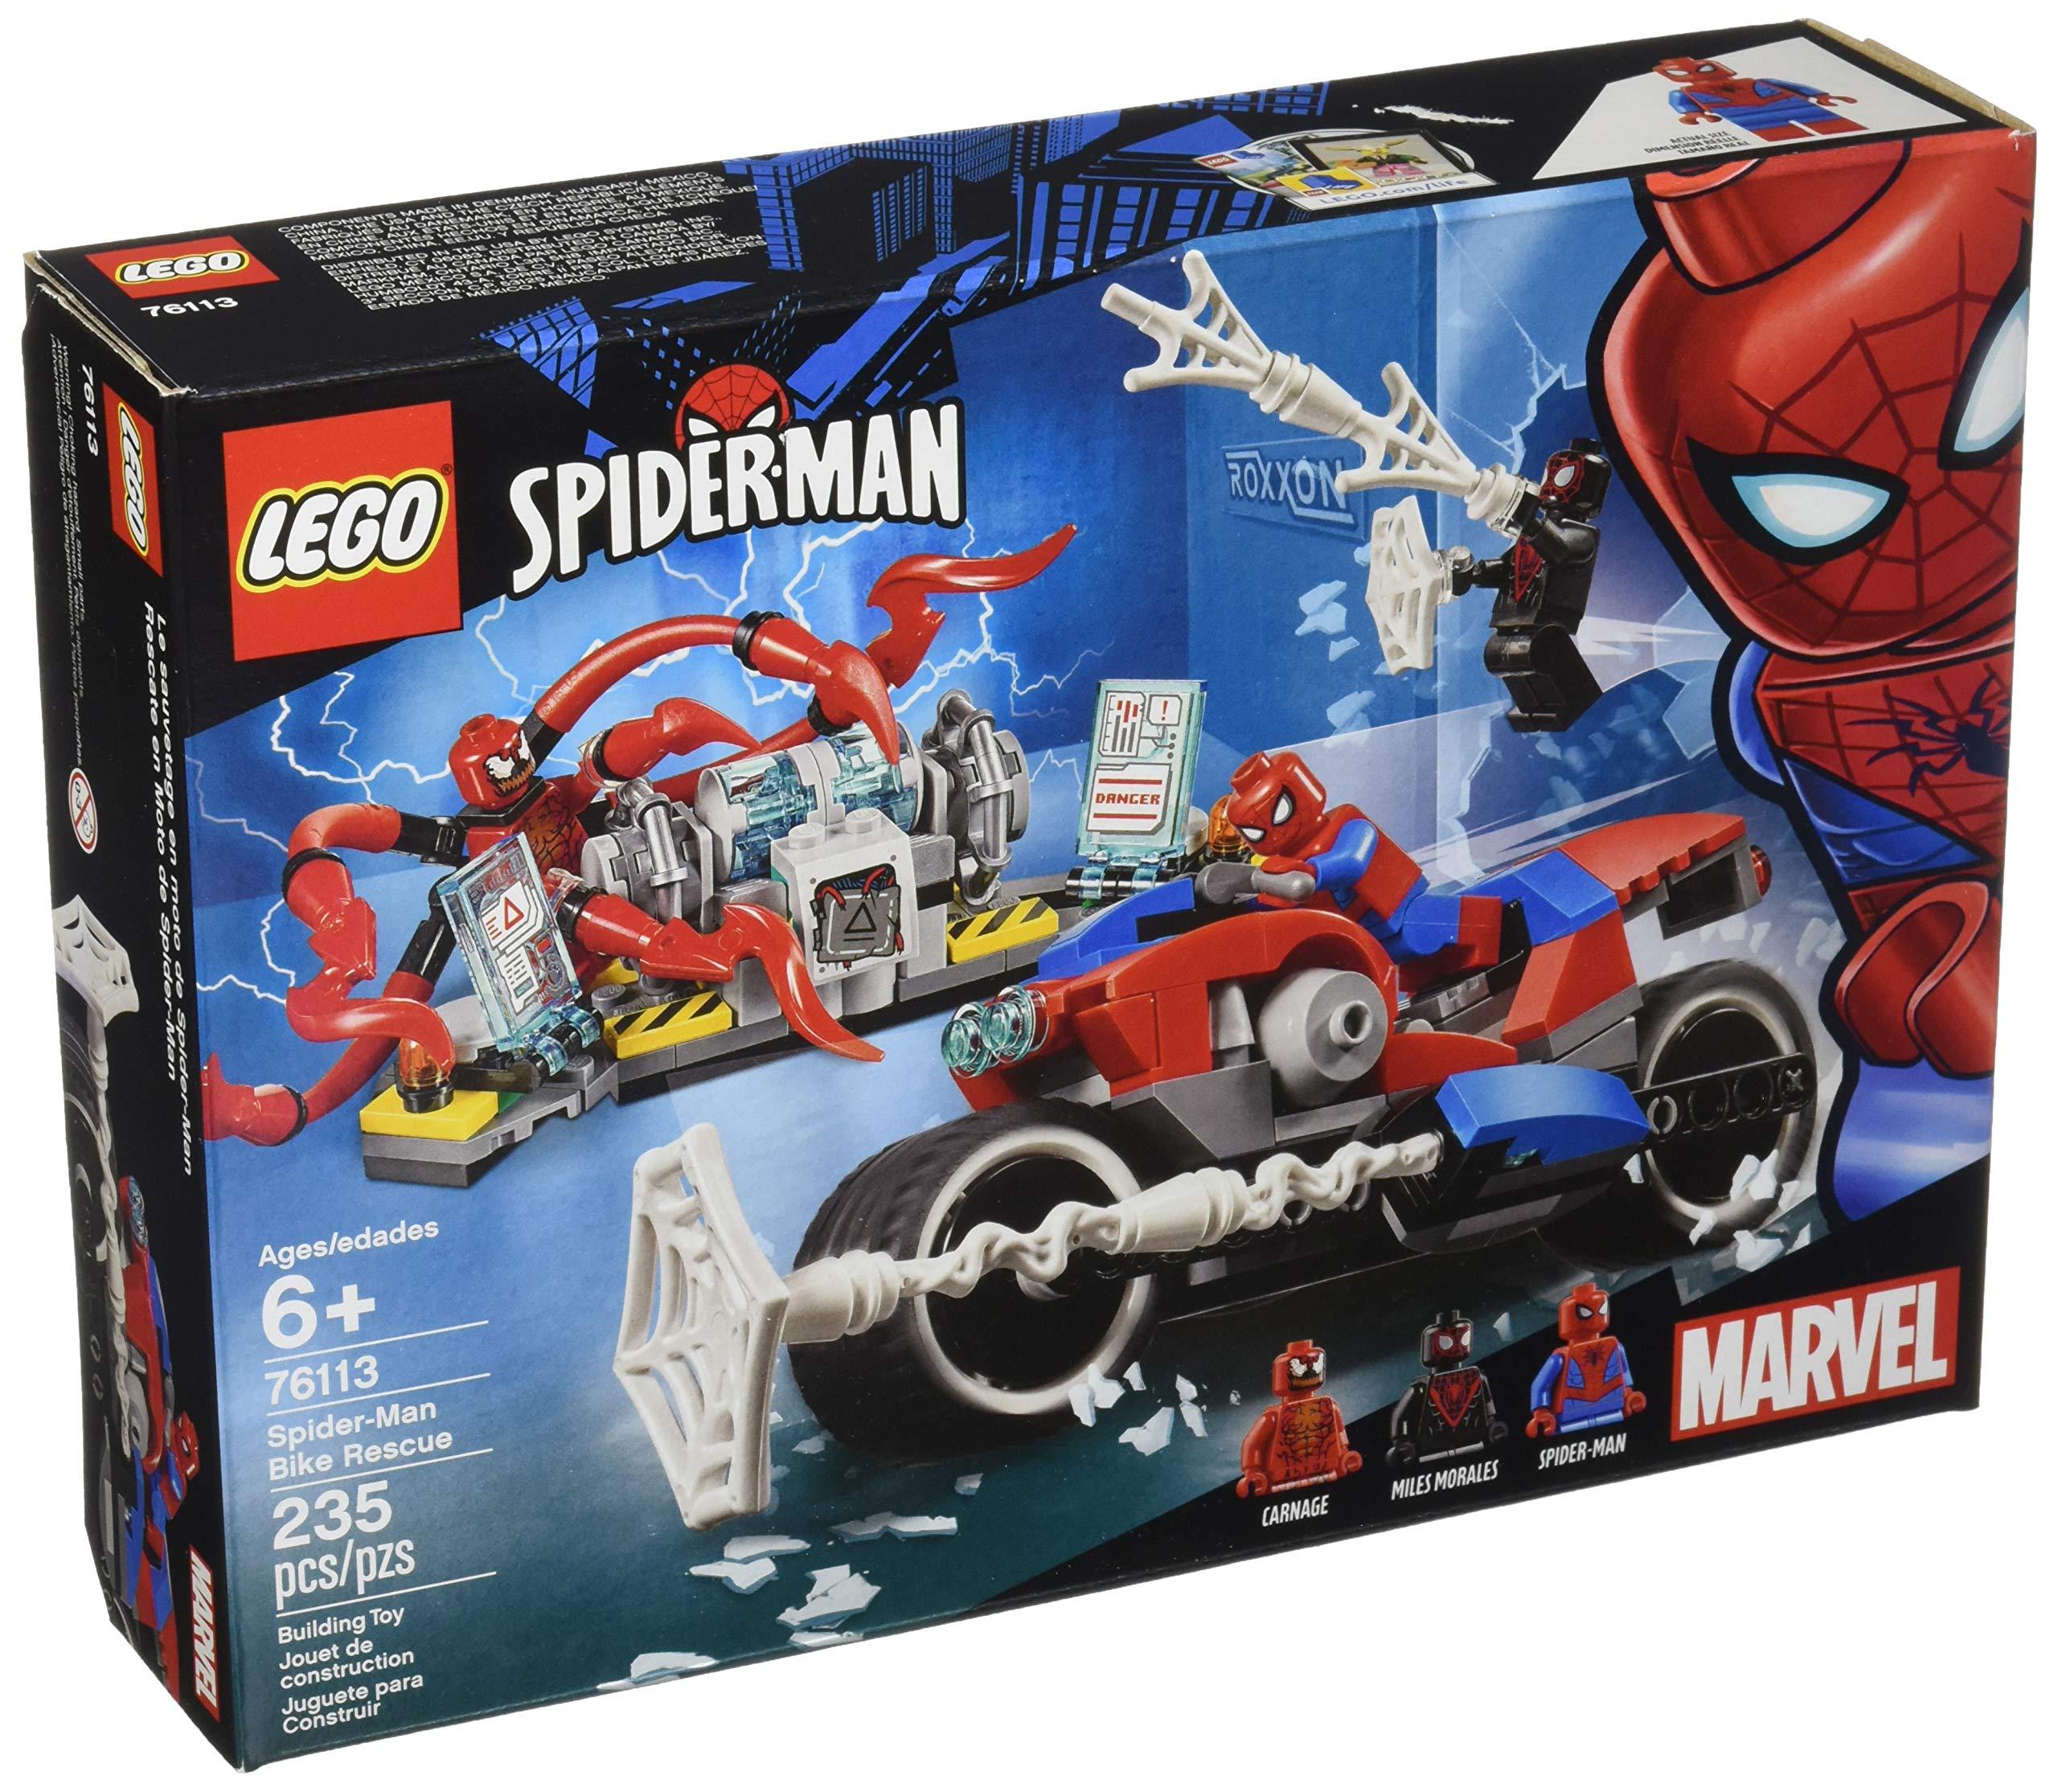 LEGO Marvel Spider-Man: Spider-Man Bike Rescue 76113 Building Kit (235 Pieces) by LEGO